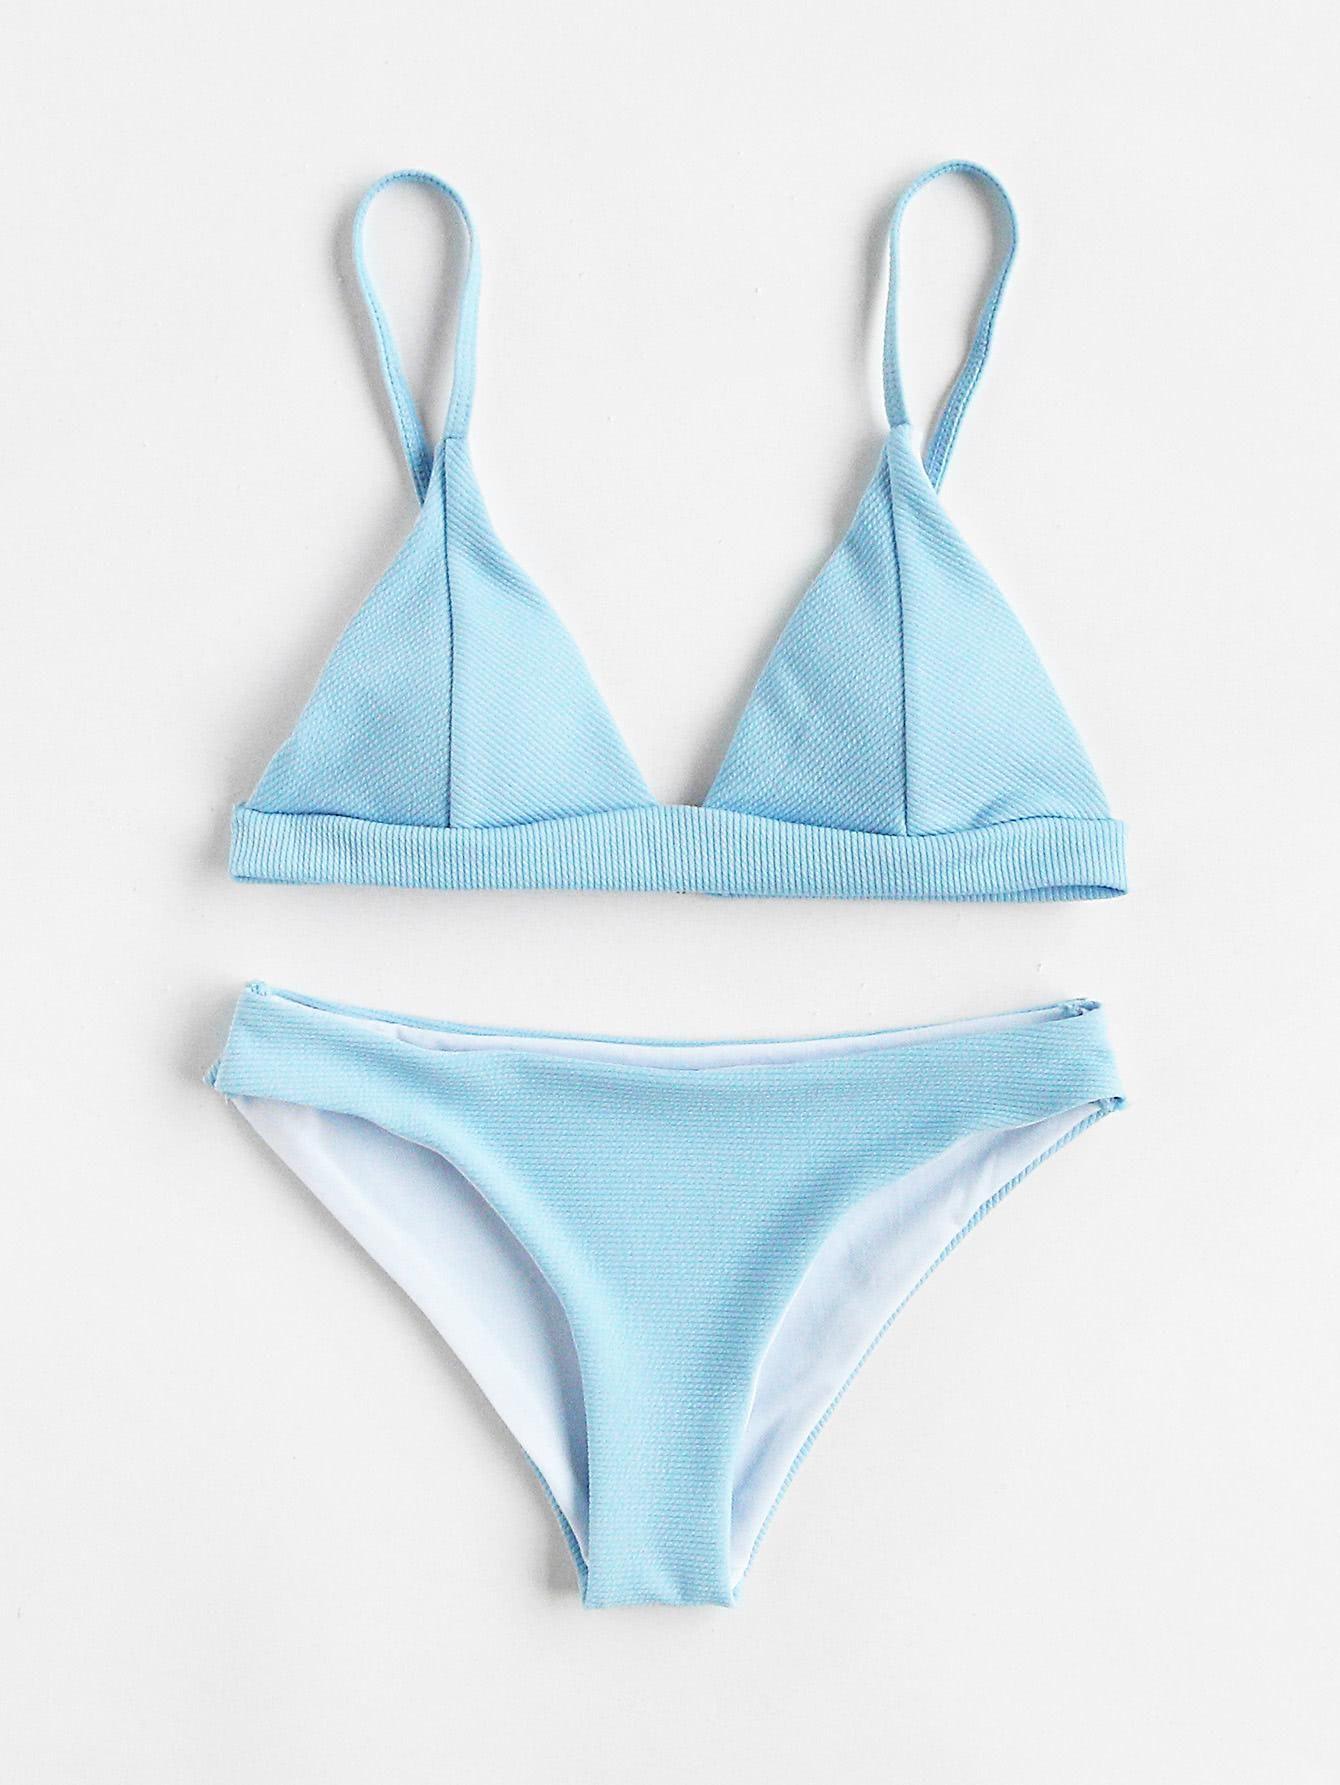 d726353d55 AdoreWe  ROMWE ROMWE Seam Detail Triangle Bikini Set - AdoreWe.com ...